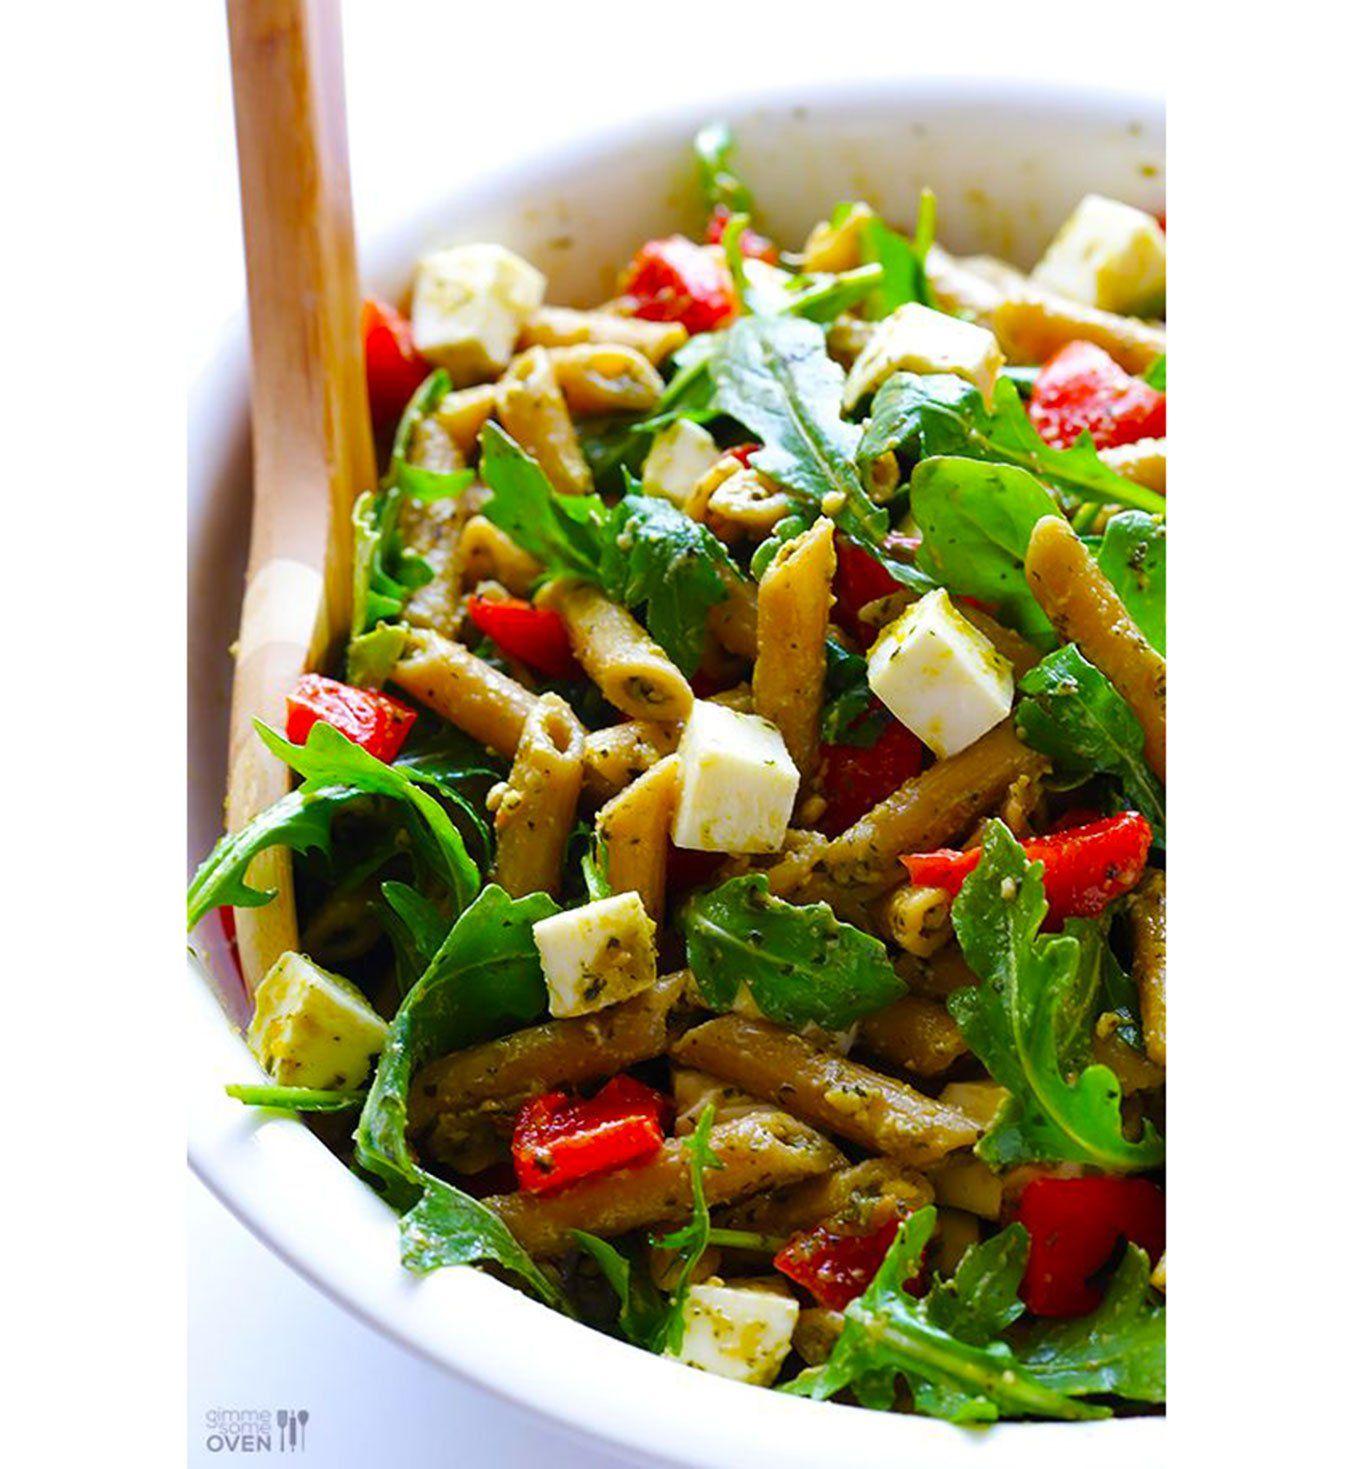 salade pate | Recettes | Pinterest | Salade pate, Pâtés et Salades - Salade Pates Pesto